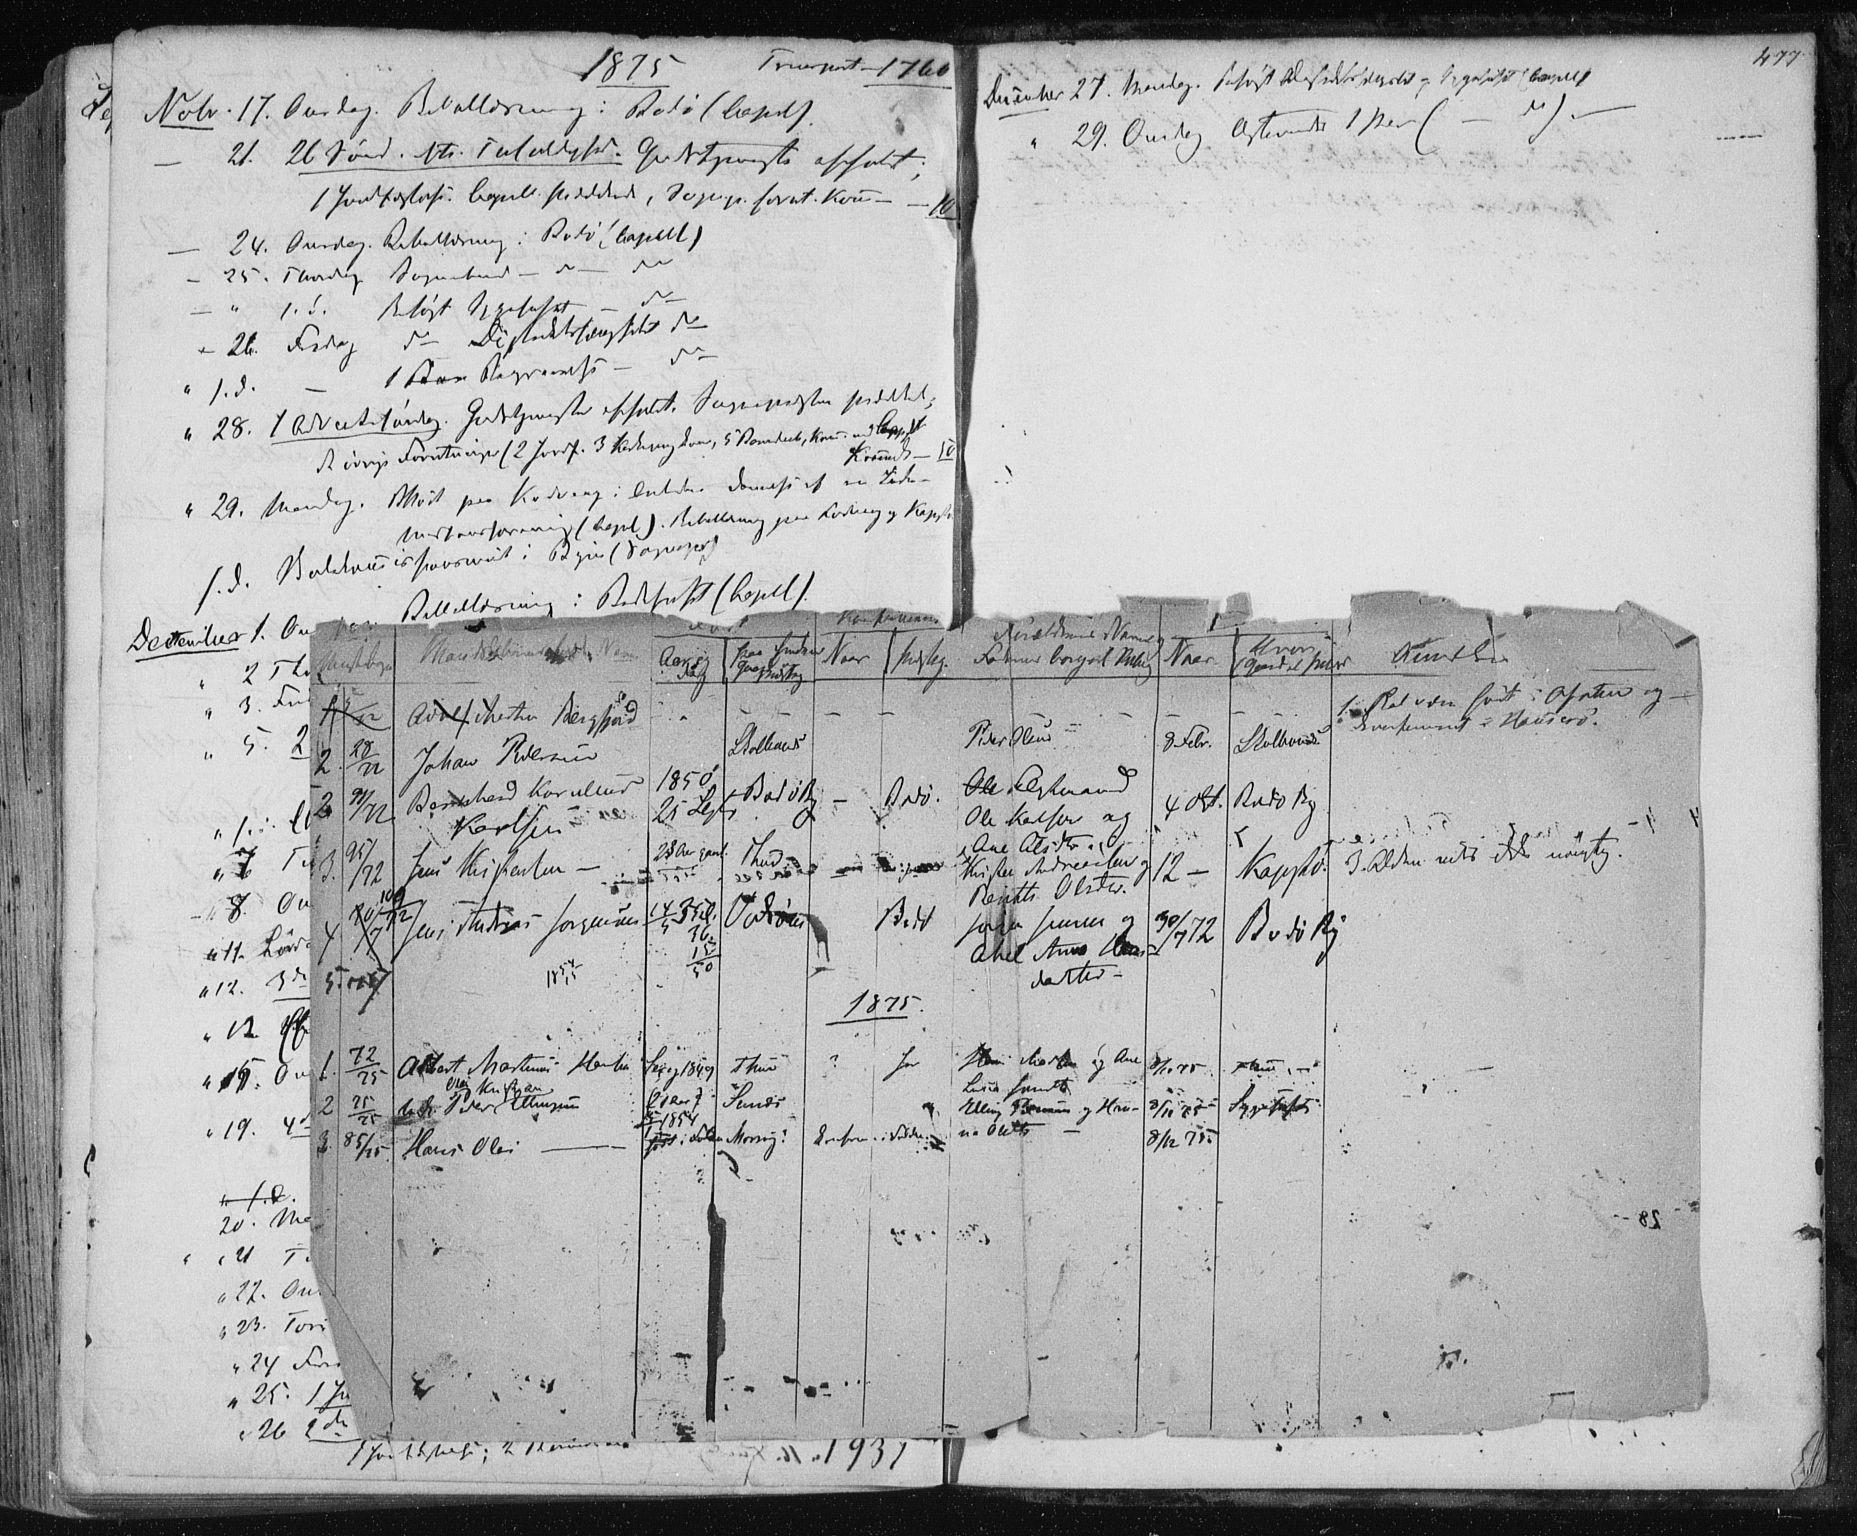 SAT, Ministerialprotokoller, klokkerbøker og fødselsregistre - Nordland, 801/L0008: Ministerialbok nr. 801A08, 1864-1875, s. 477